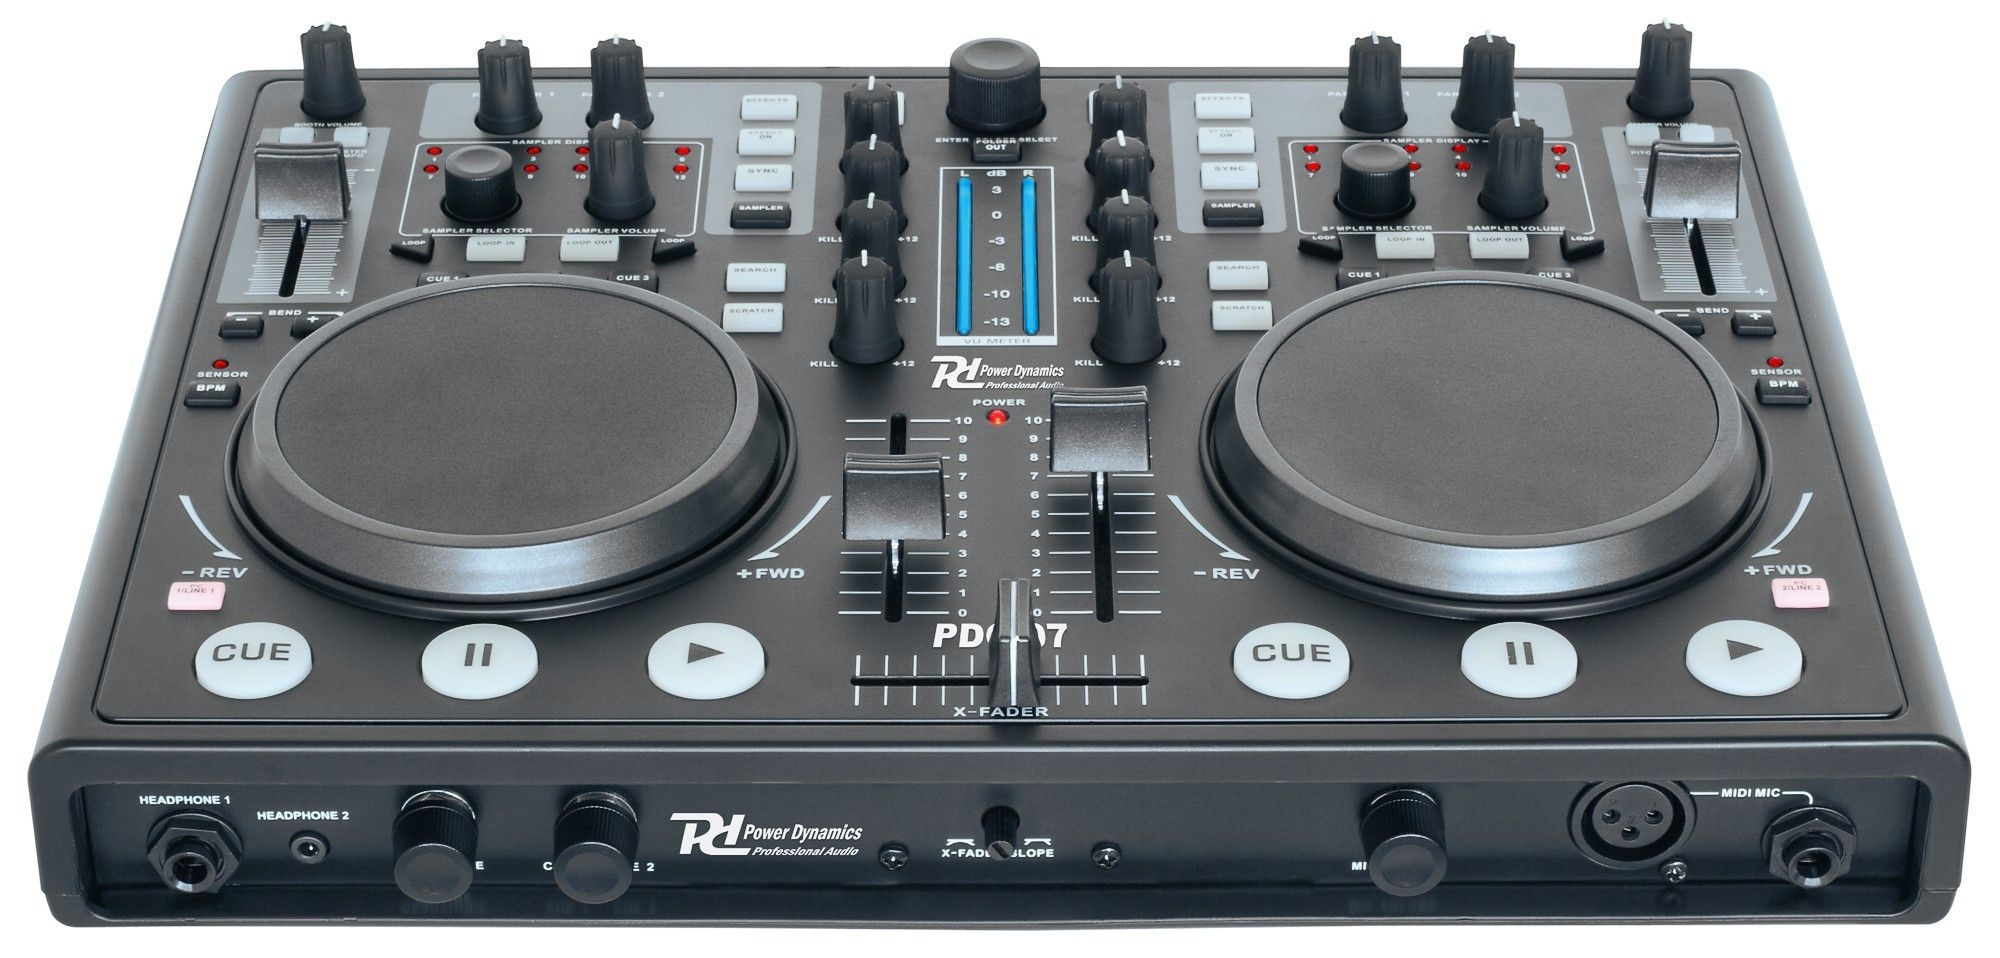 Afbeelding van Power Dynamics PDC-07 DJ controller USB met geluidskaart & Virtual DJ ...